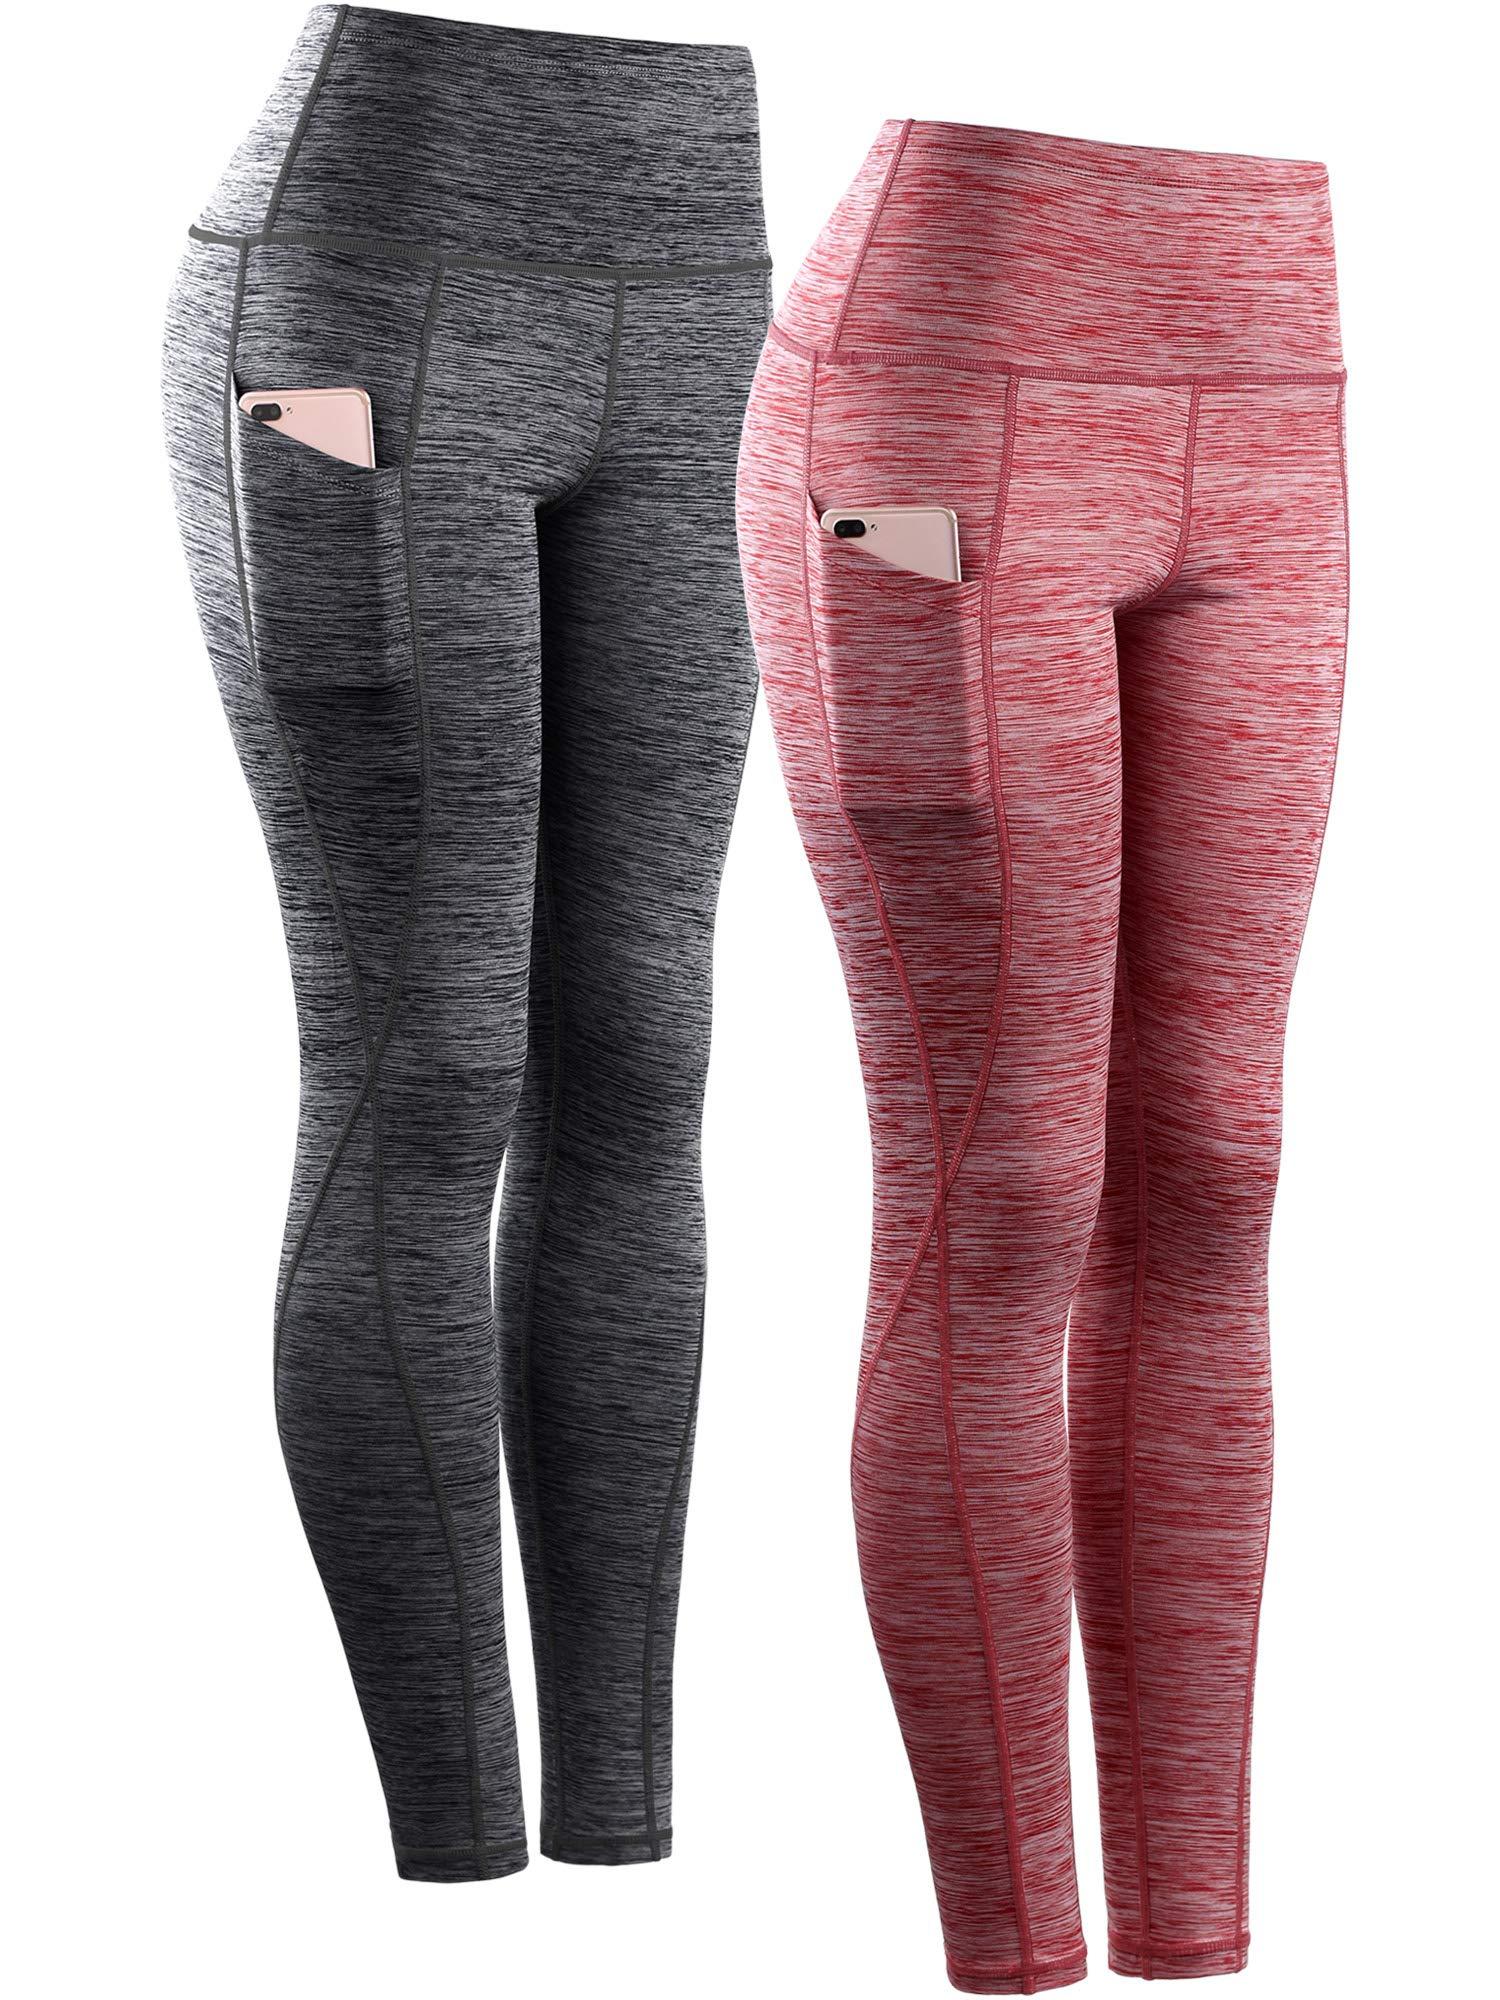 Neleus Tummy Control High Waist Workout Running Leggings for Women,9033,Yoga Pant 2 Pack,Black,Red,S,EU M